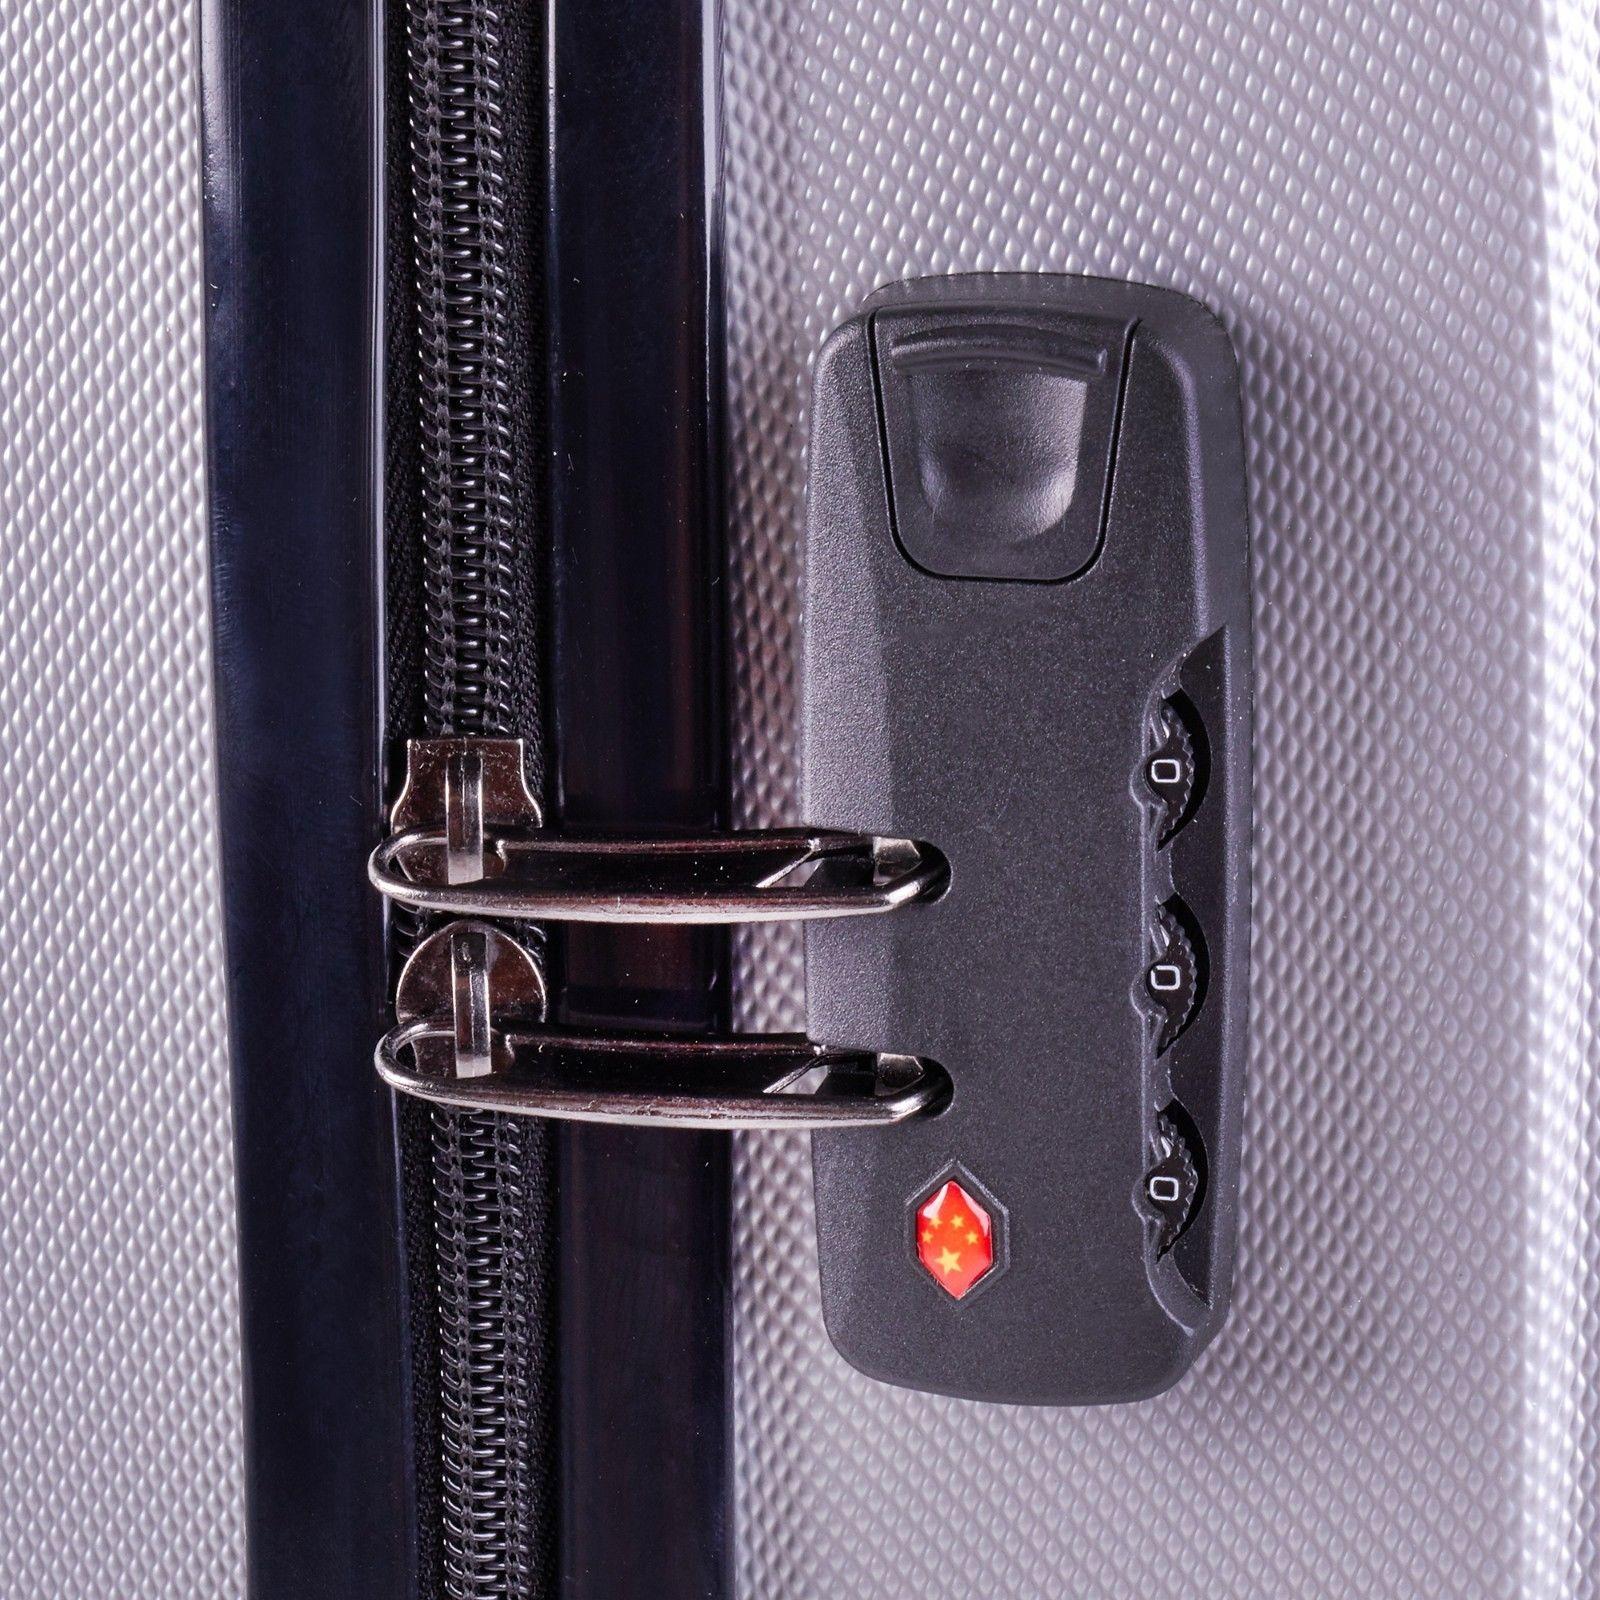 Milano-Premium-3pc-ABS-Luggage-Suitcase-Luxury-Hard-Case-Shockproof-Travel-Set thumbnail 38